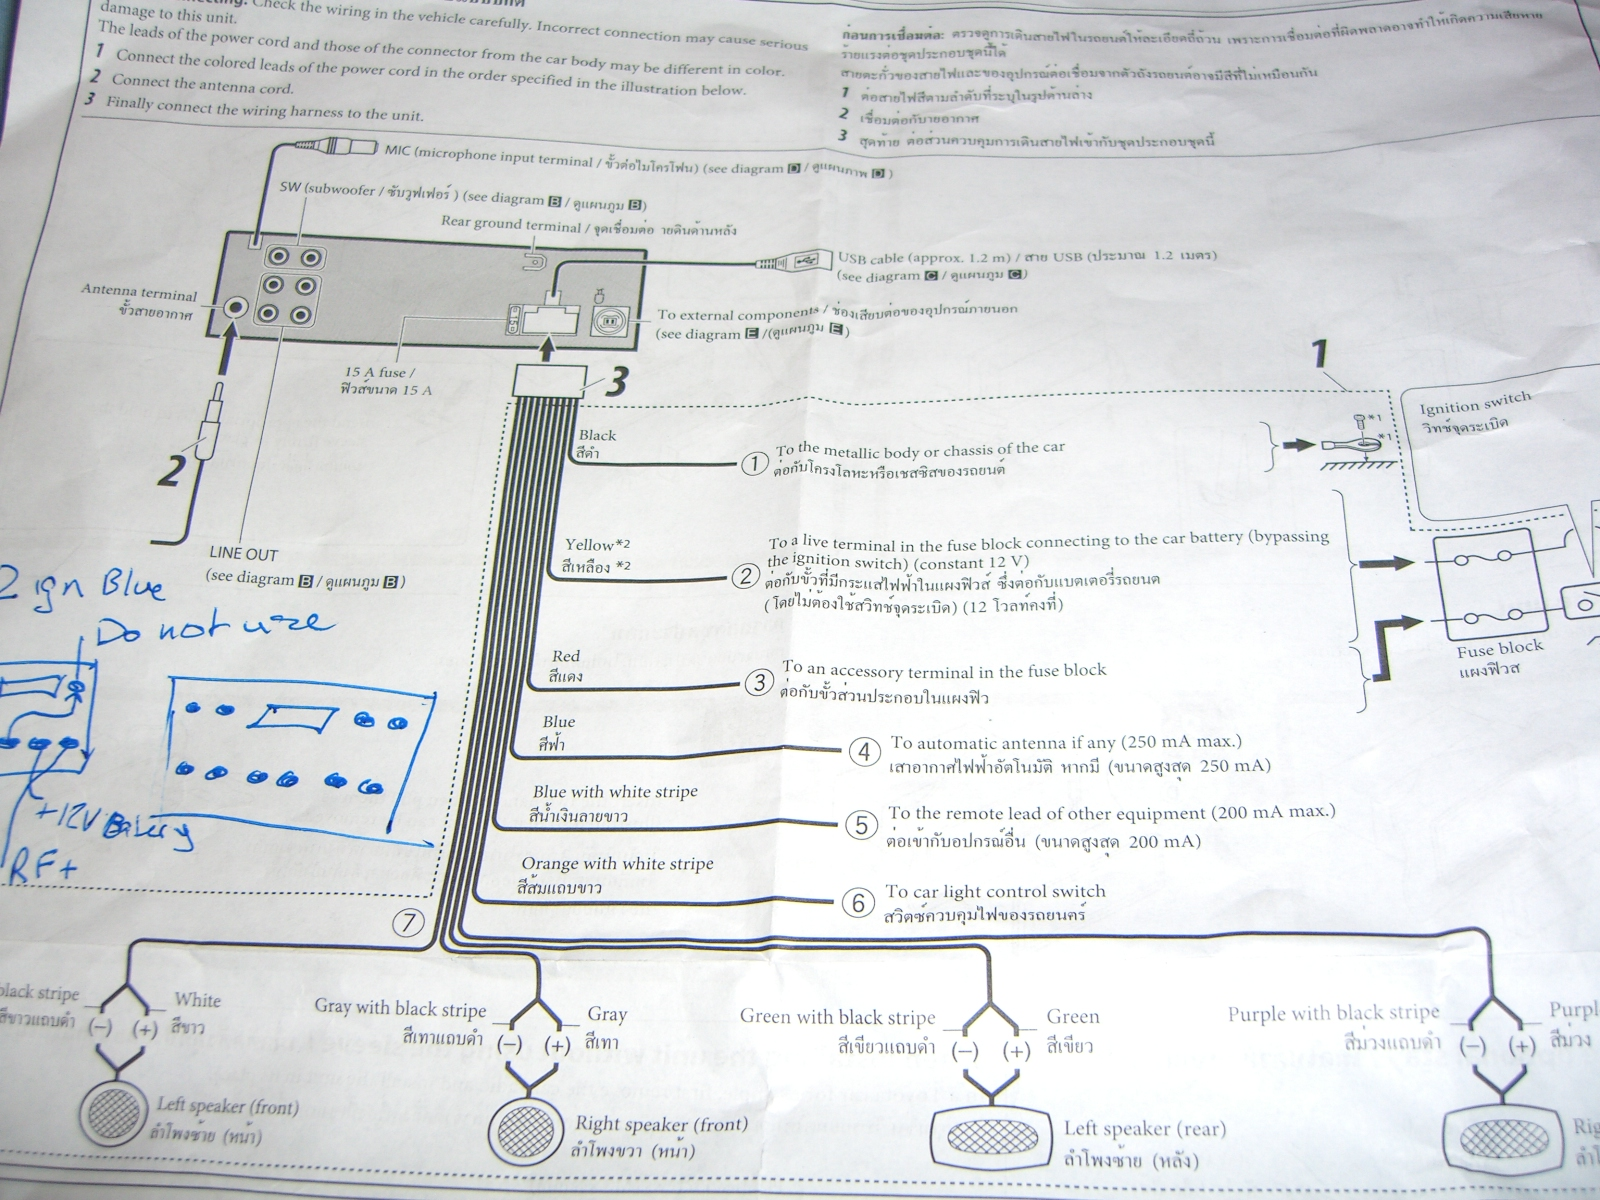 R34 Audio Wiring Car Electrical Sau Community Antenna Diagram Post 72381 0 94729400 1297351274 Thumb